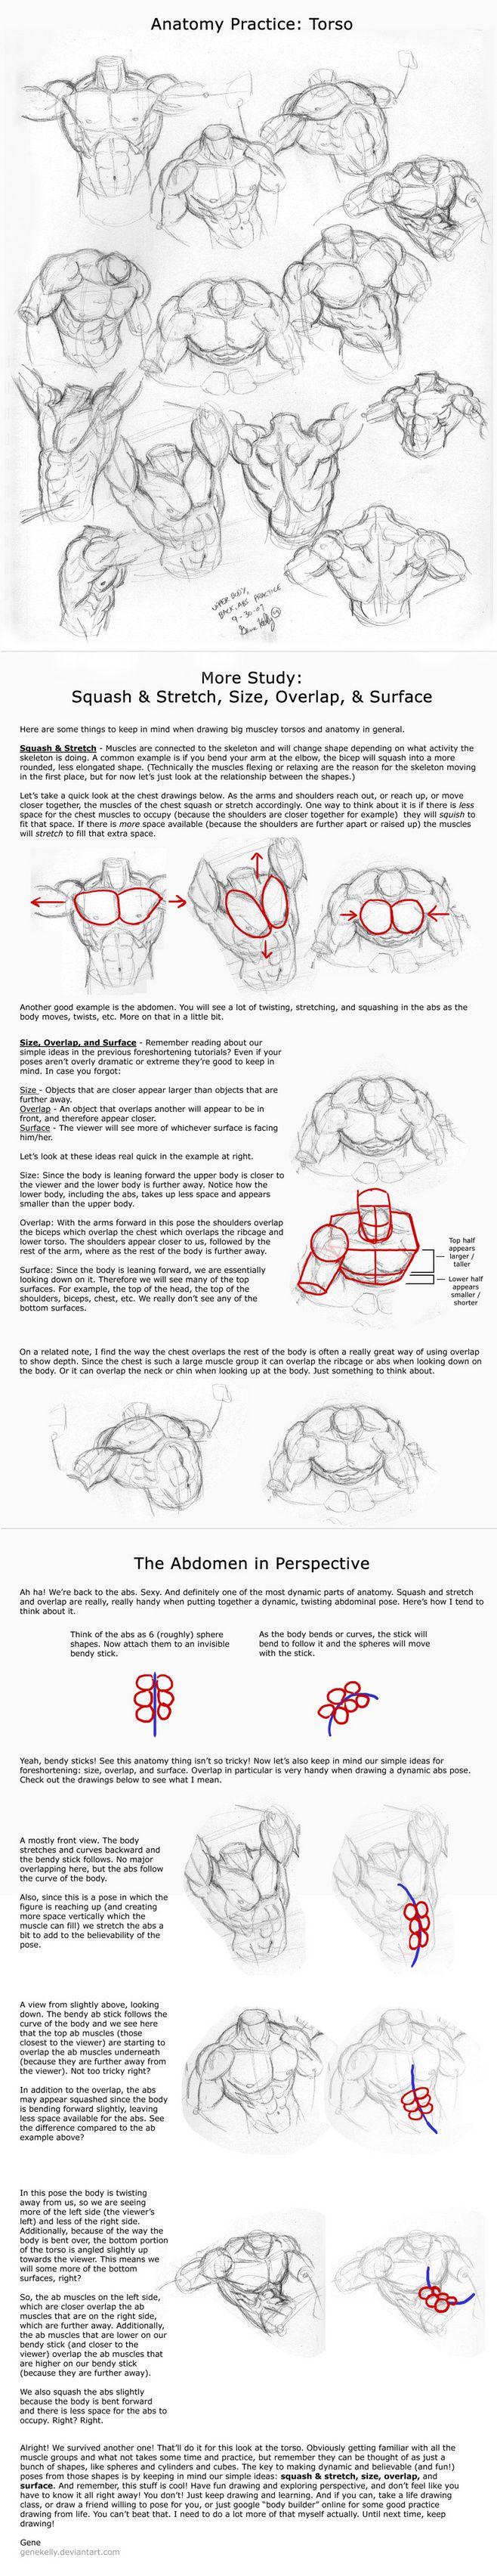 Wed 4: Torso Practic...@UnaT采集到绘画教程(99图)_花瓣平面设计